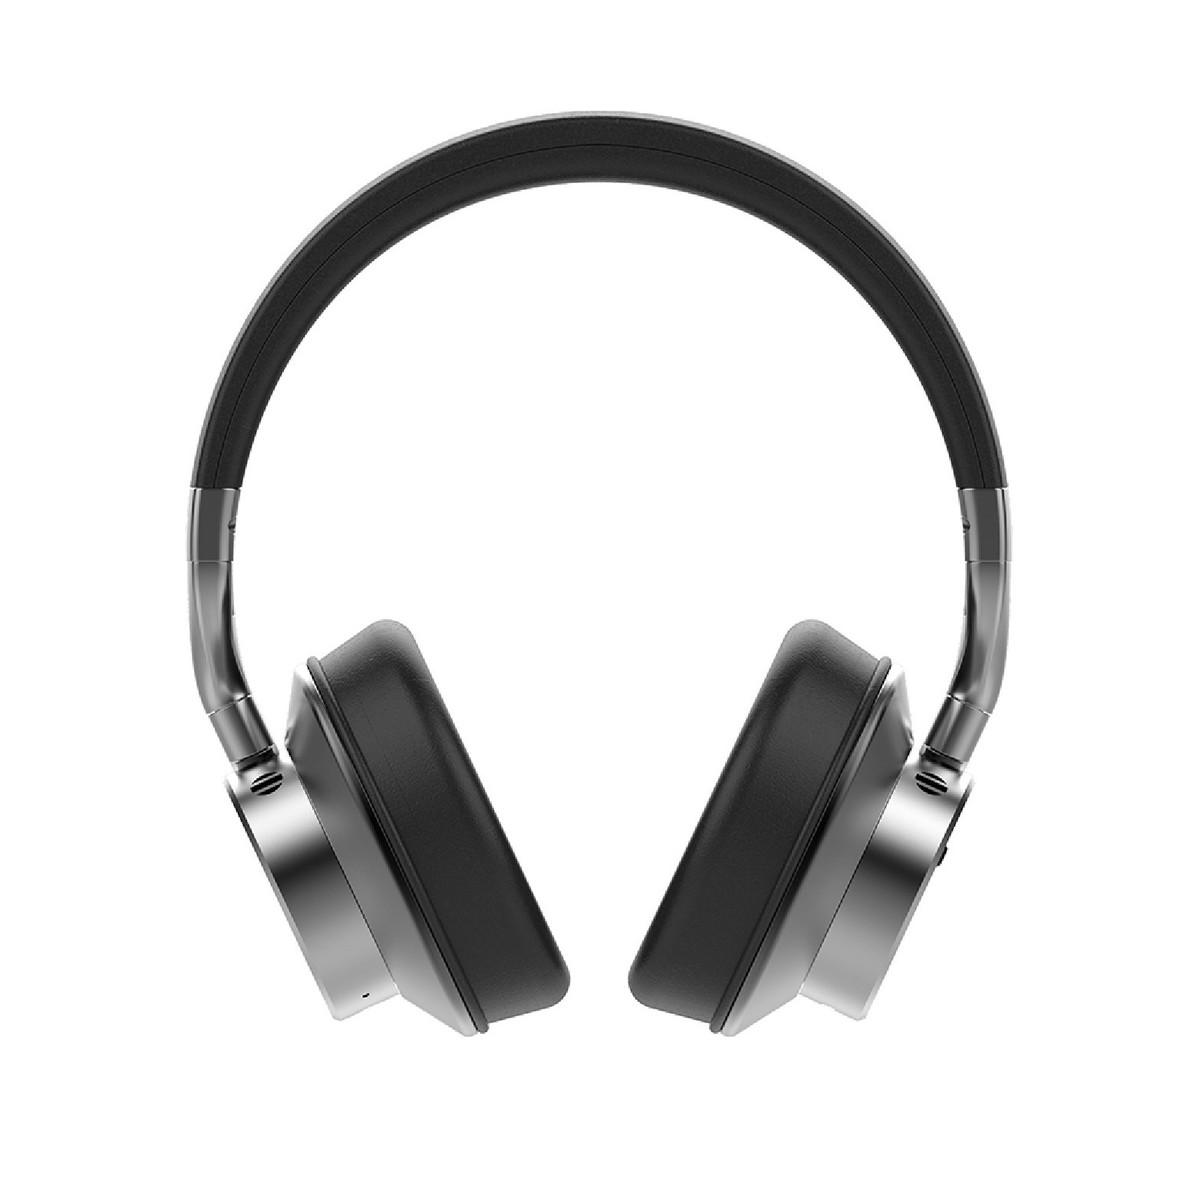 73e1dbf036a Damson Headspace Wireless Headphones, Graphite Grey - Main. Loading zoom